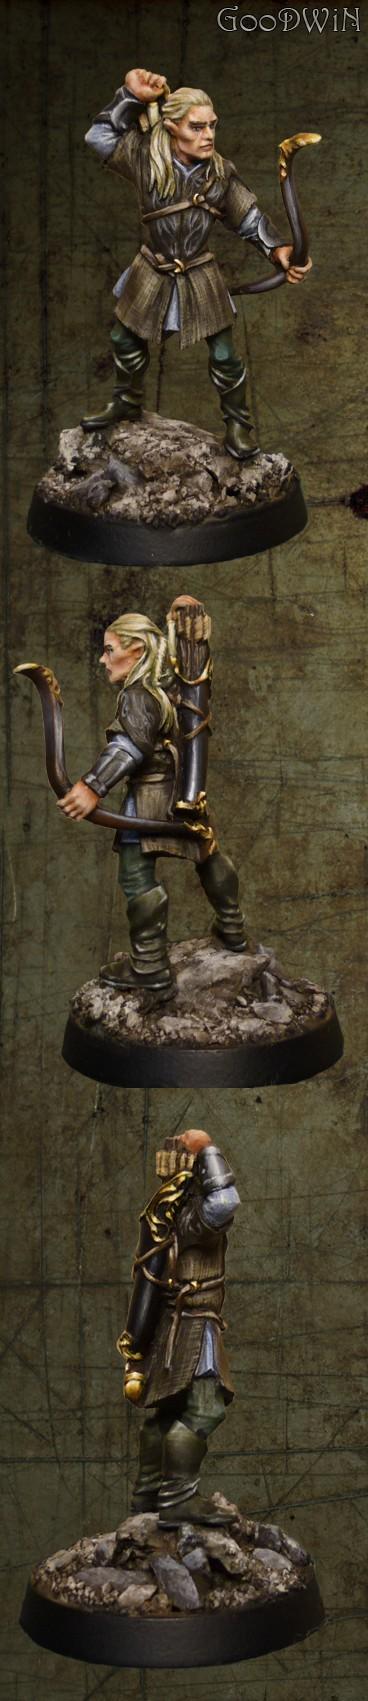 CoolMiniOrNot - Legolas | Legolas, Lord of the rings, Lotr